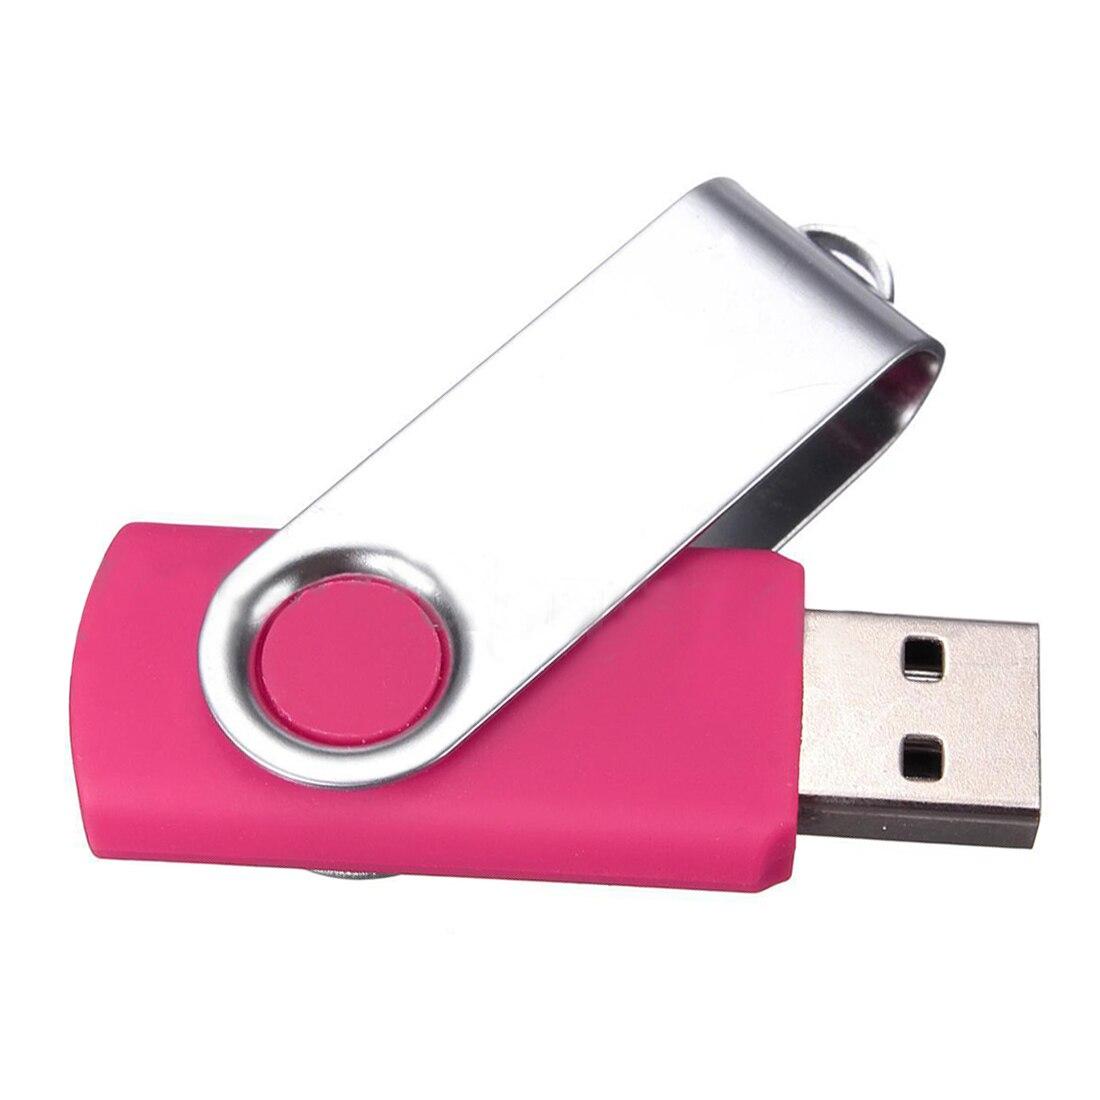 USB 2,0 флеш-память ручка флэш-накопитель Цвет: розовый 256 МБ